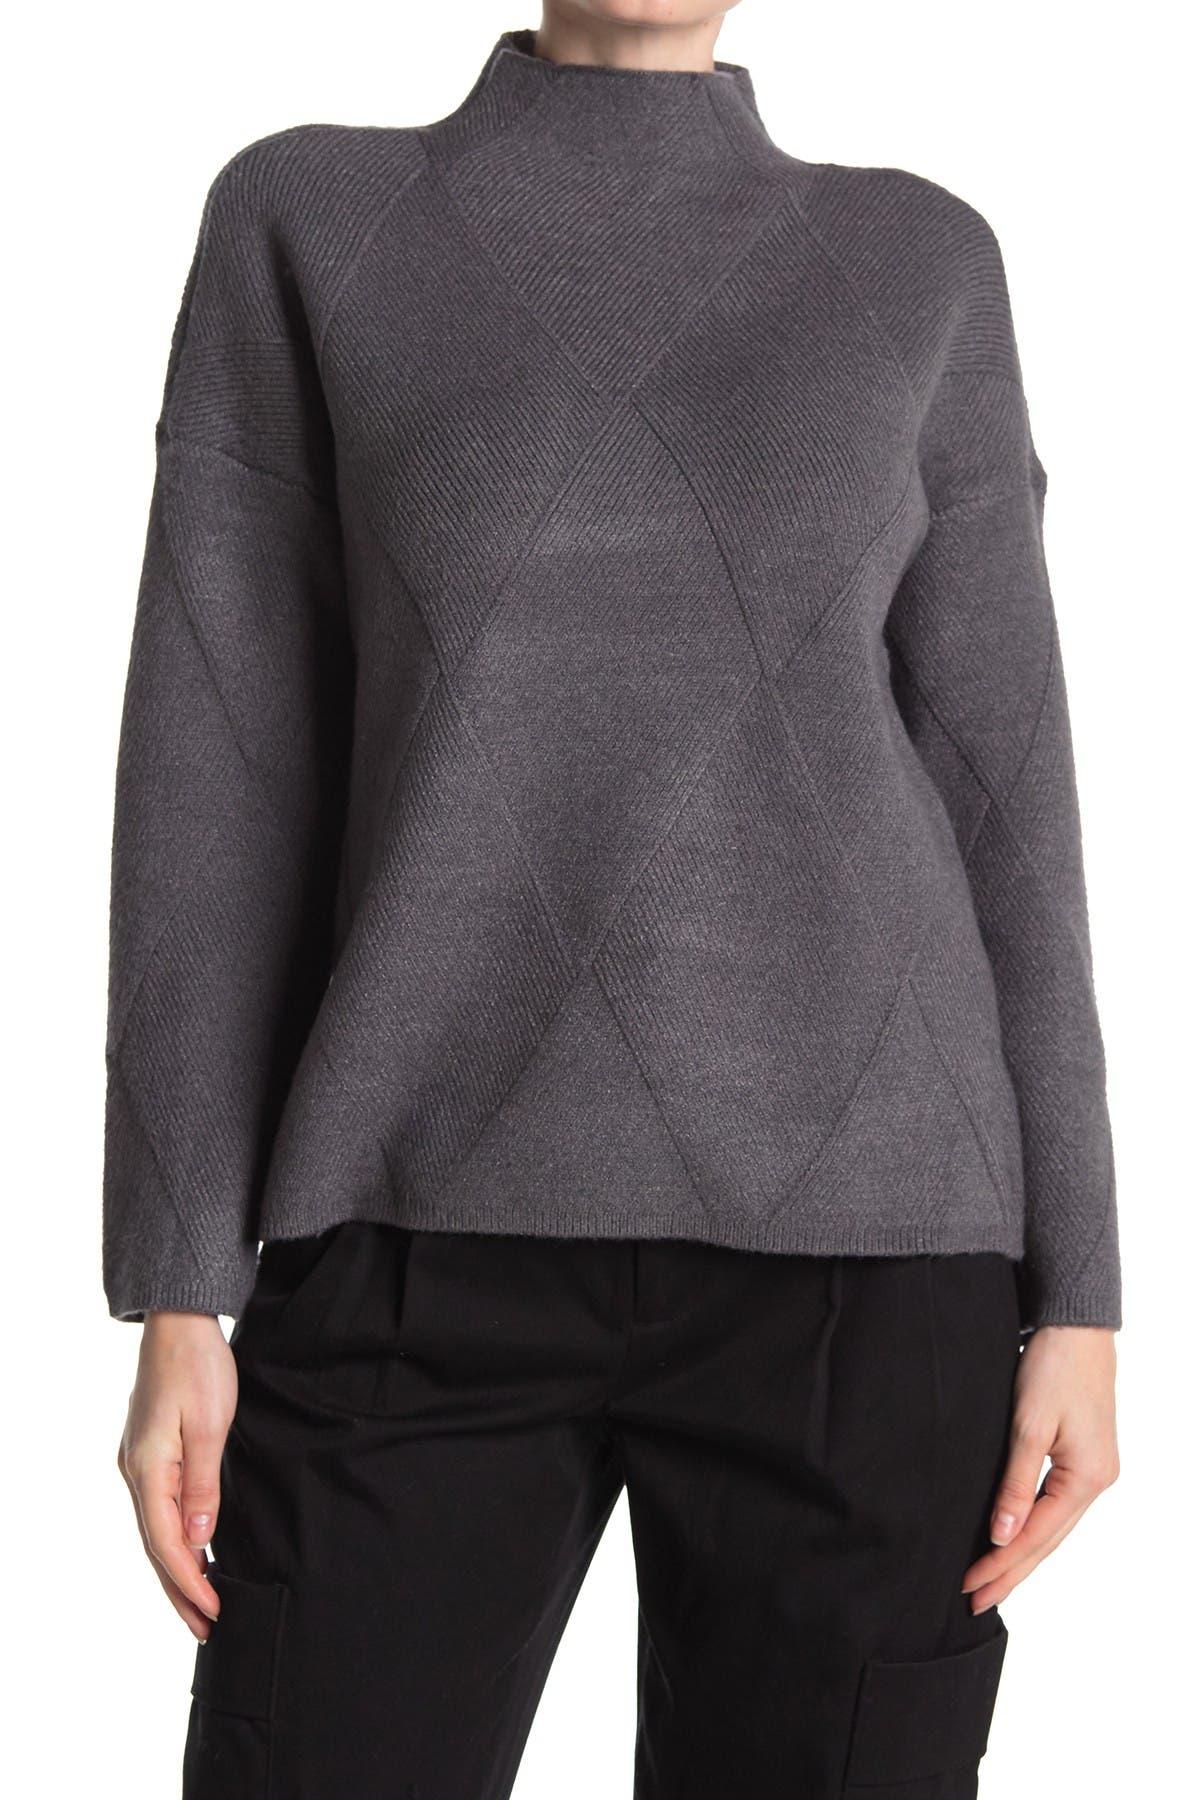 Image of Cyrus Diamond Argyle Mock Neck Sweater